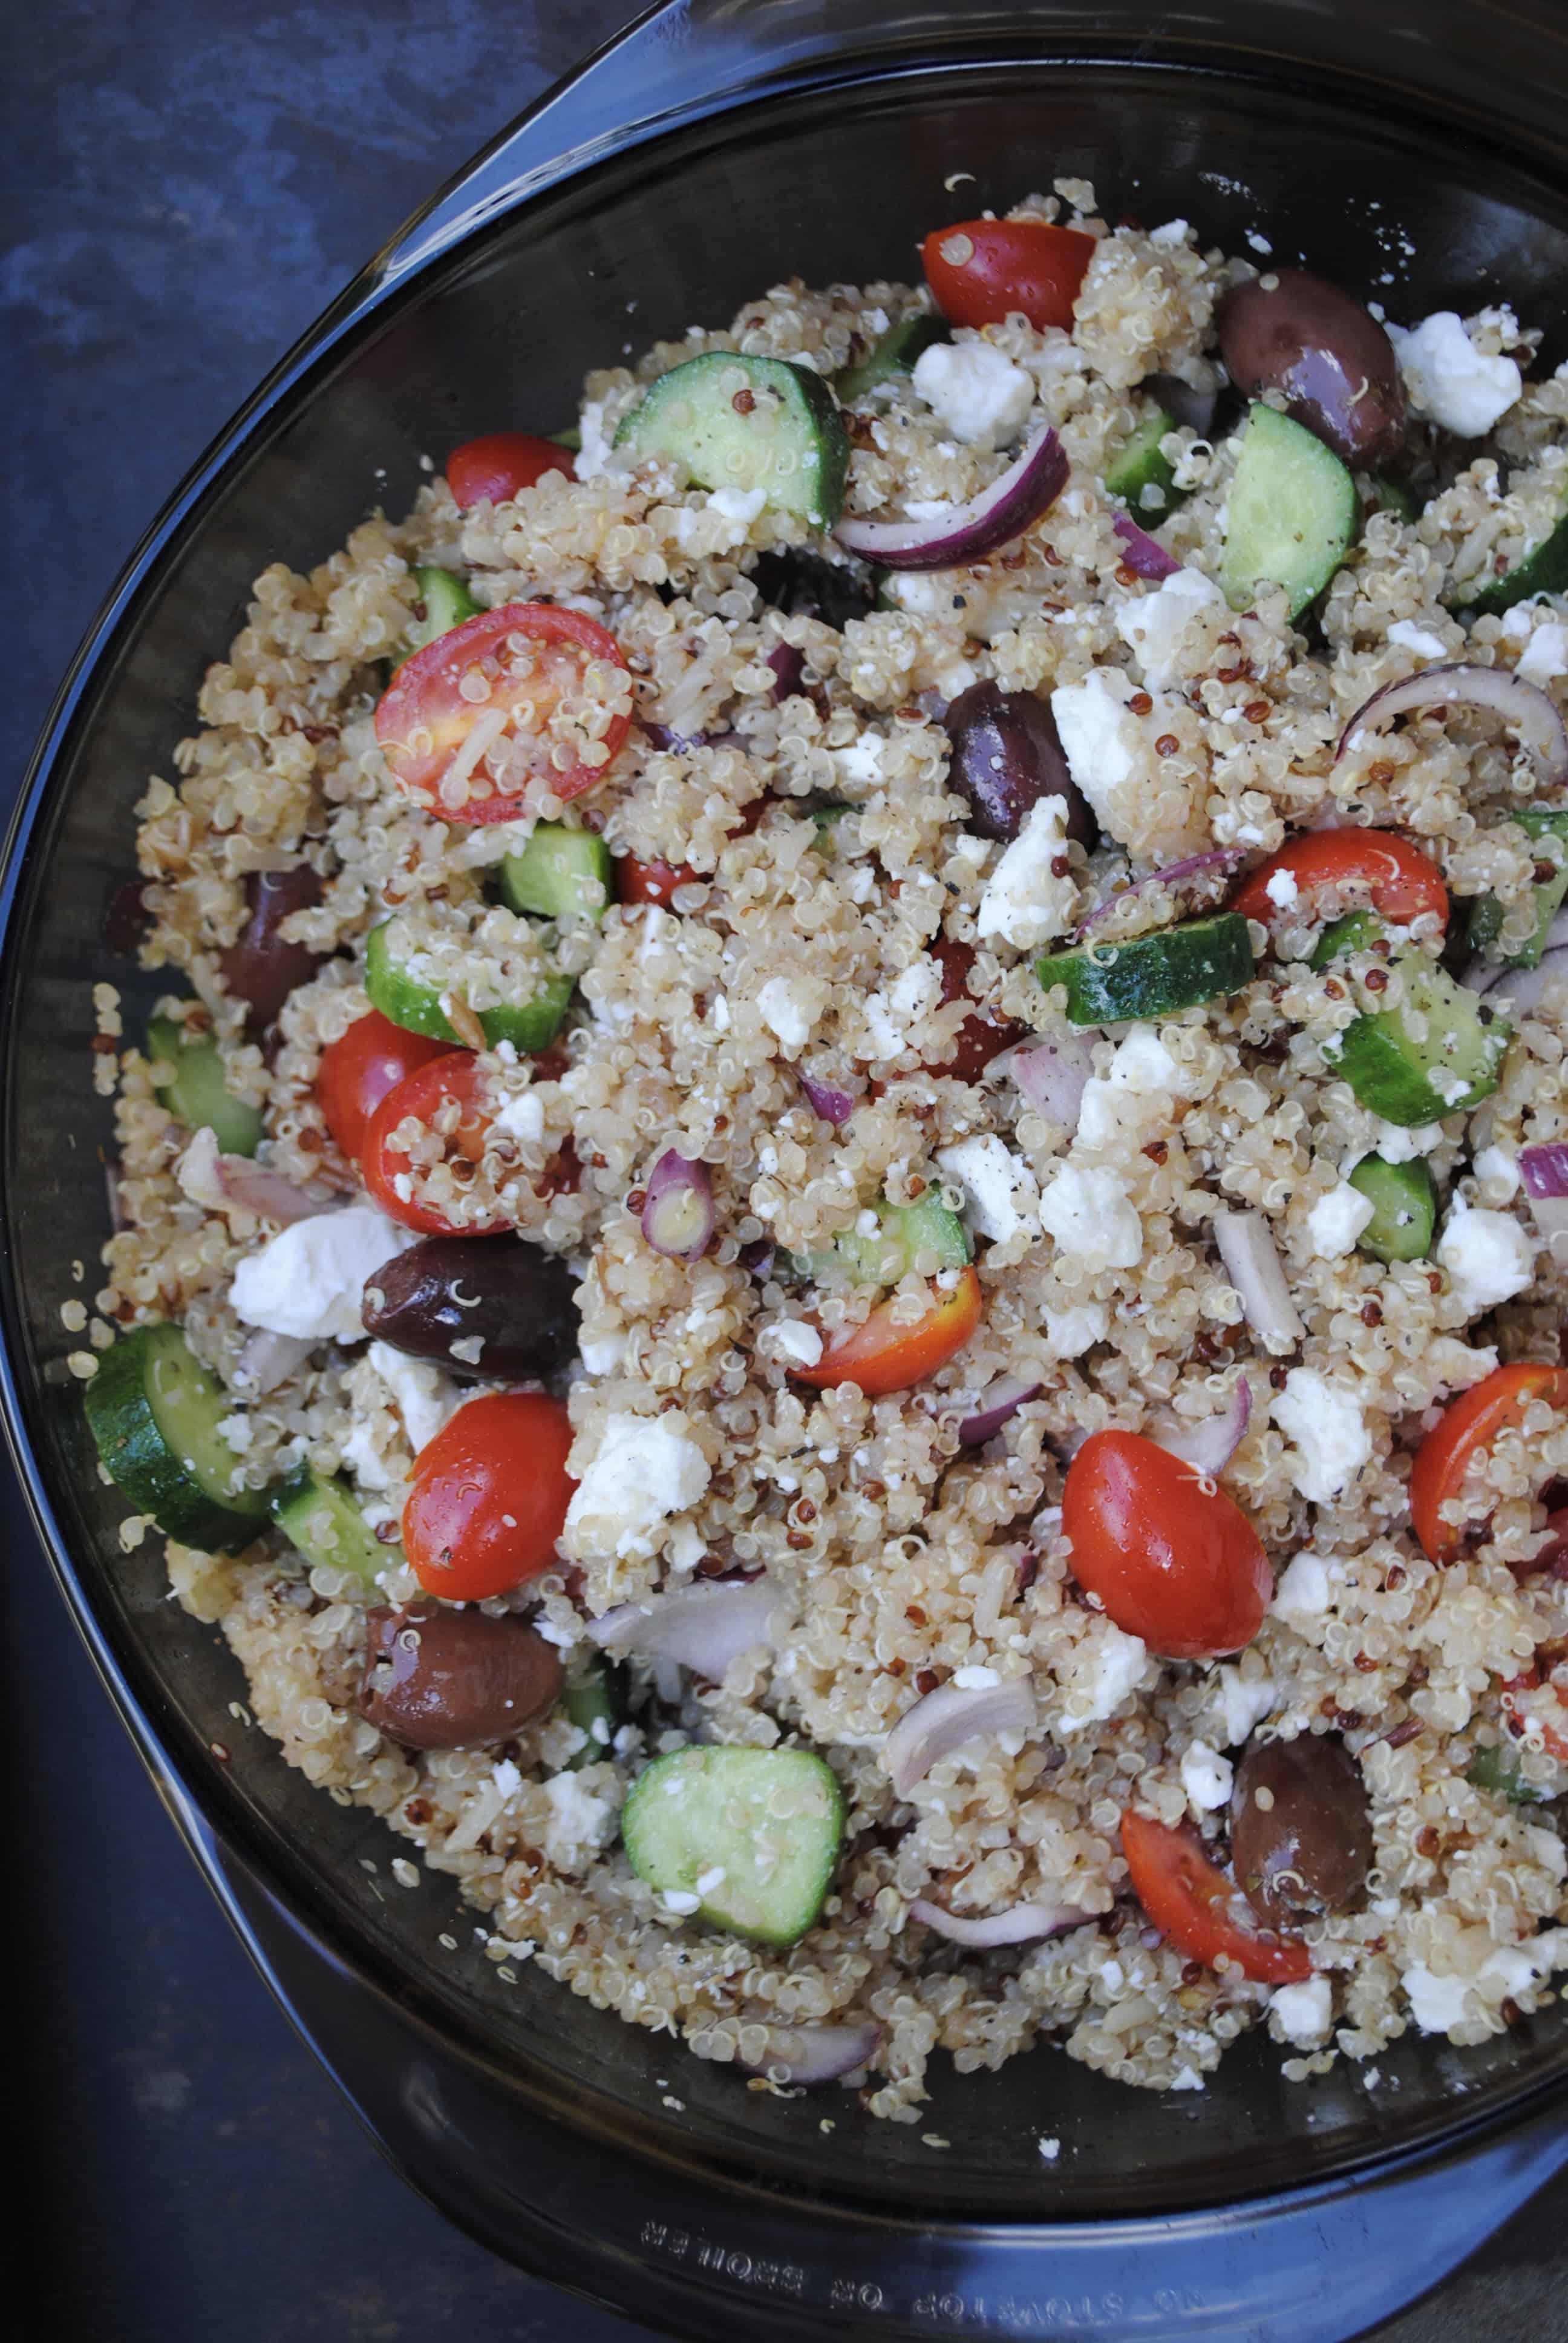 Greek quinoa salad. So fresh and light for summer.